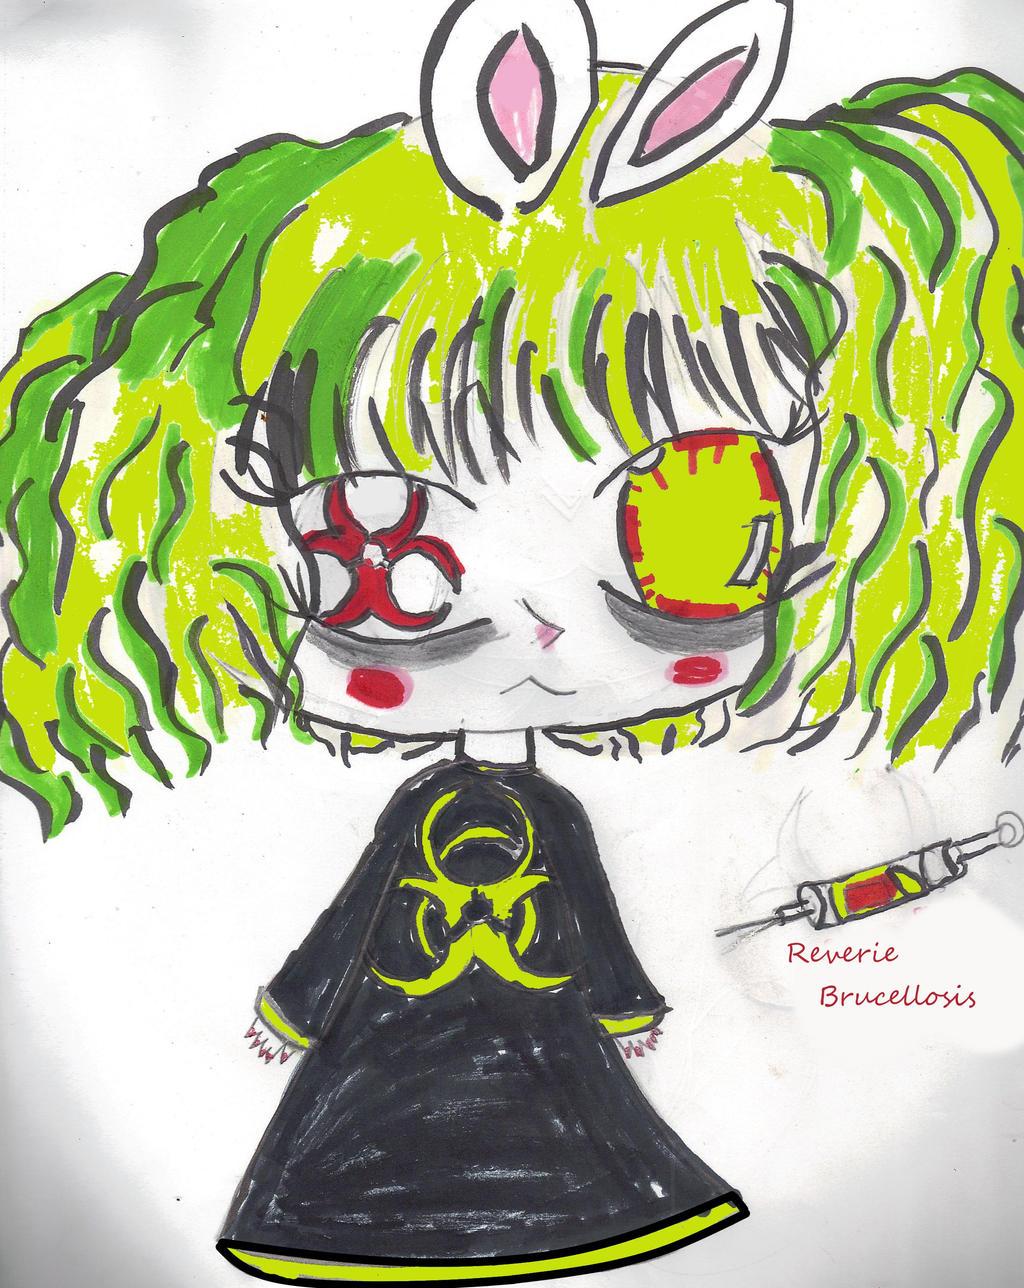 killerbunny_lxxxi__reverie_brucellosis_by_akaichounokoe-d9f5704.jpg